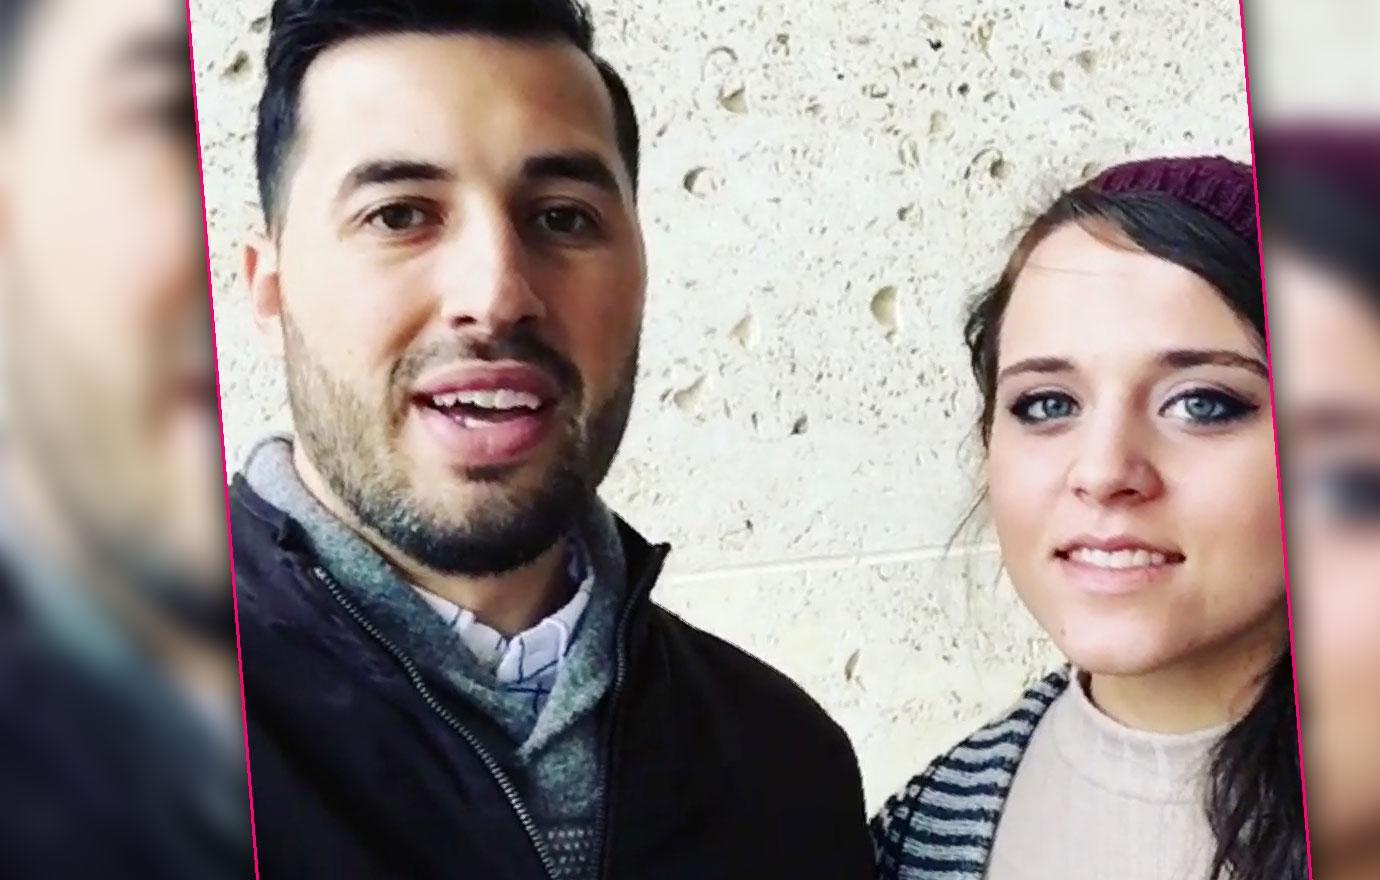 Jinger Duggar Celebrates Candlelight Romantic Birthday With Husband